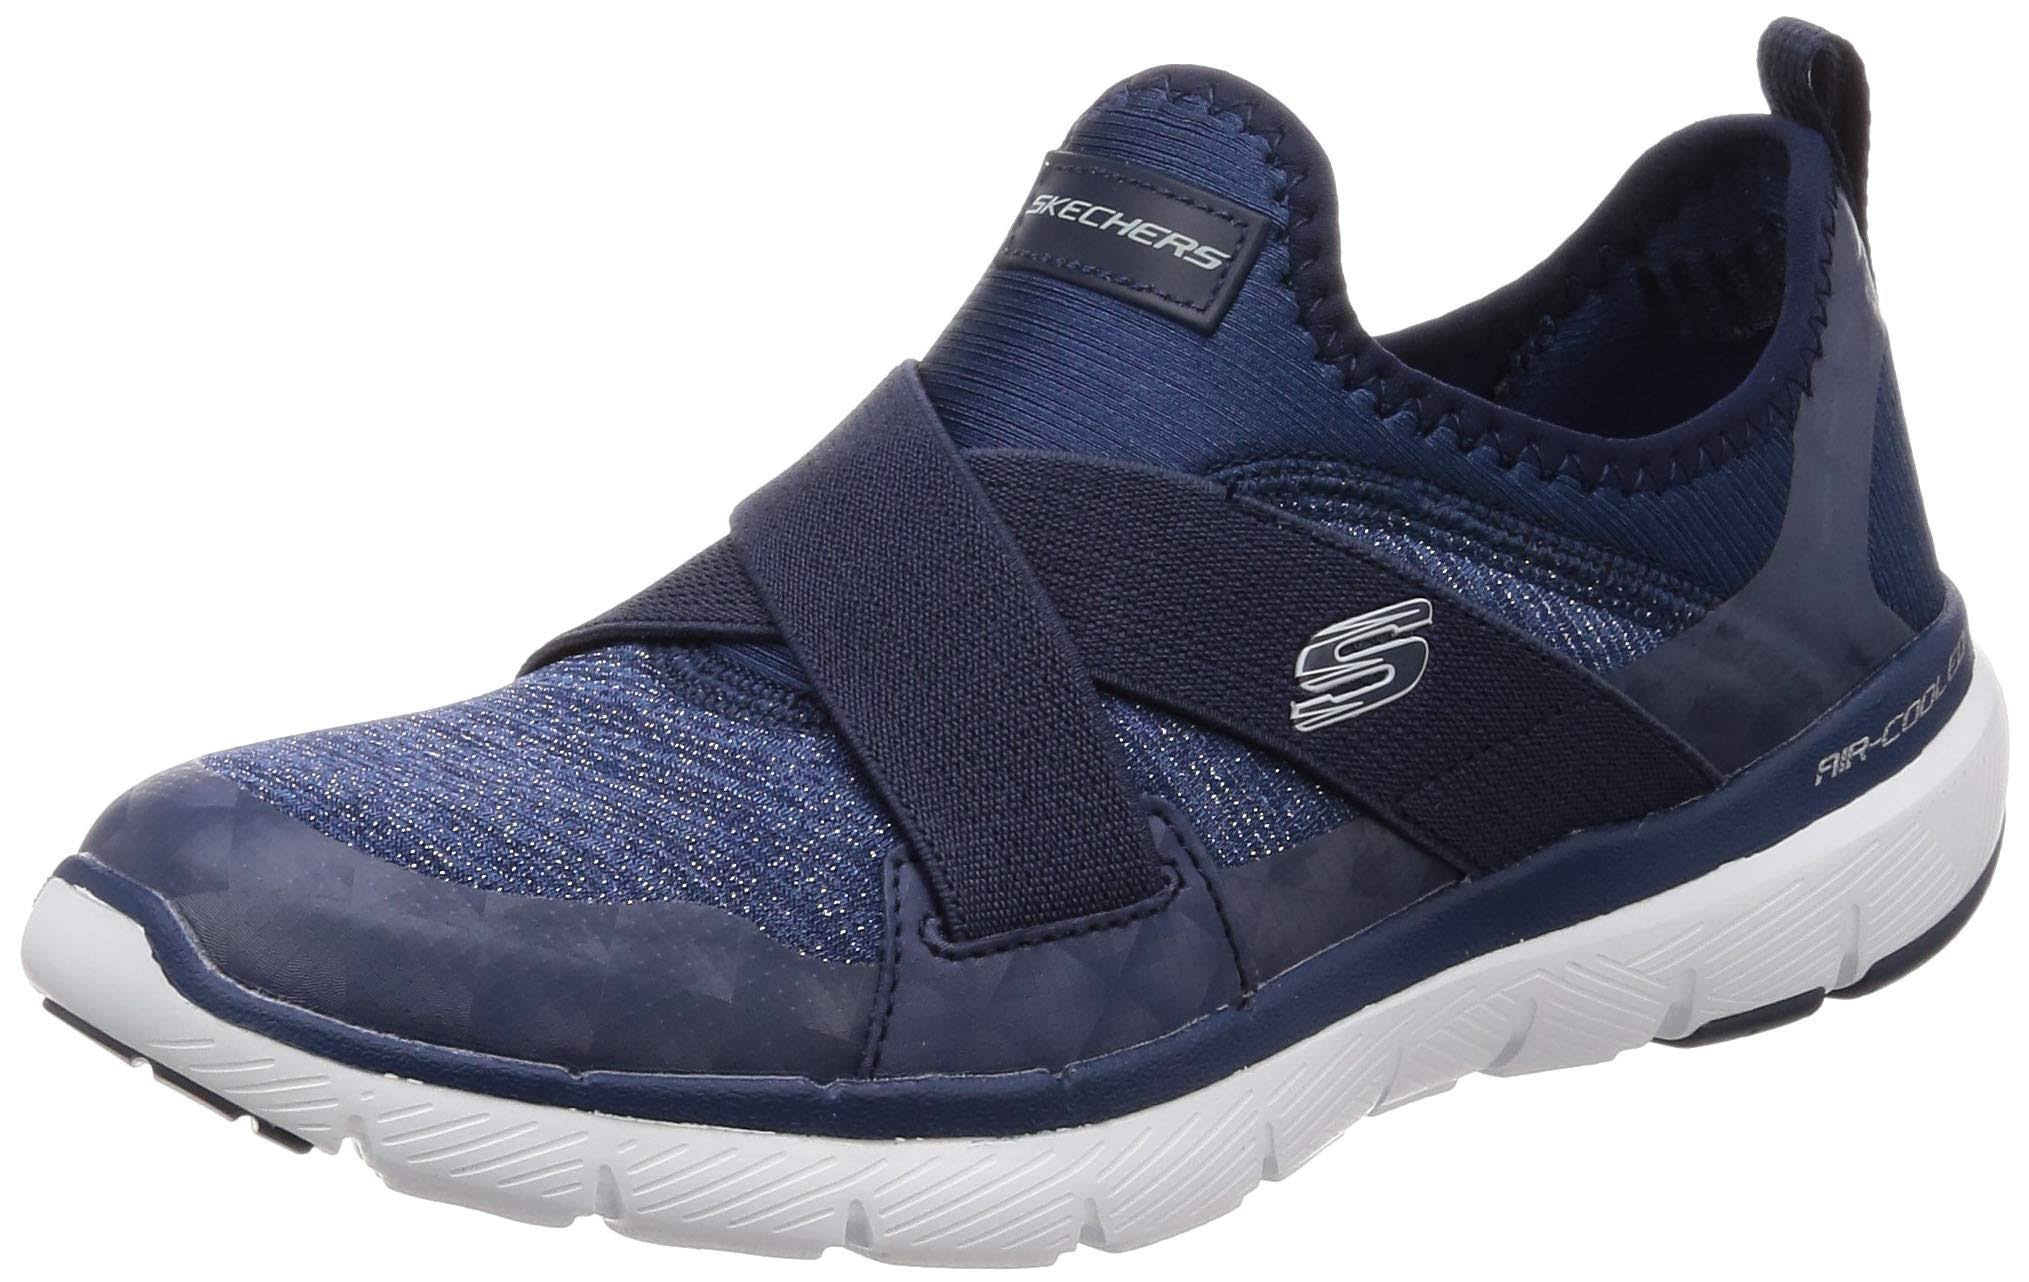 Skechers On Flex Nvy 0 3 Nvy Sneaker navy Slip 38 Appeal finest Blau Eu 5 Damen Hour Rr5qx8wR